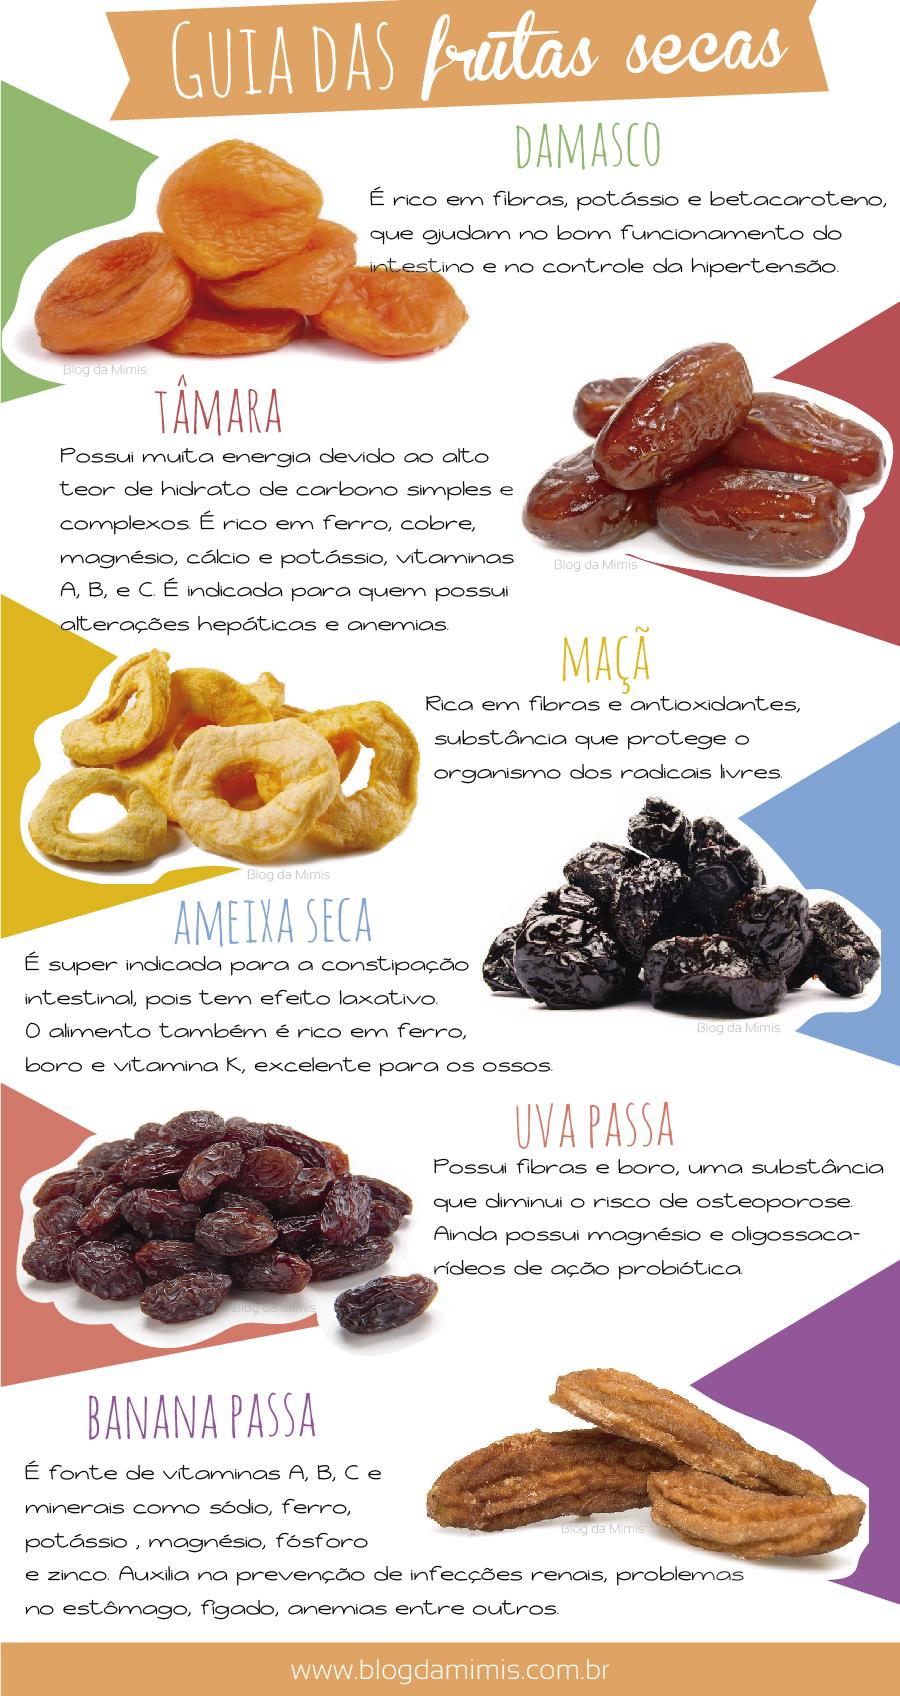 frutas-secasblog-da-mimis-michelle-franzoni-3